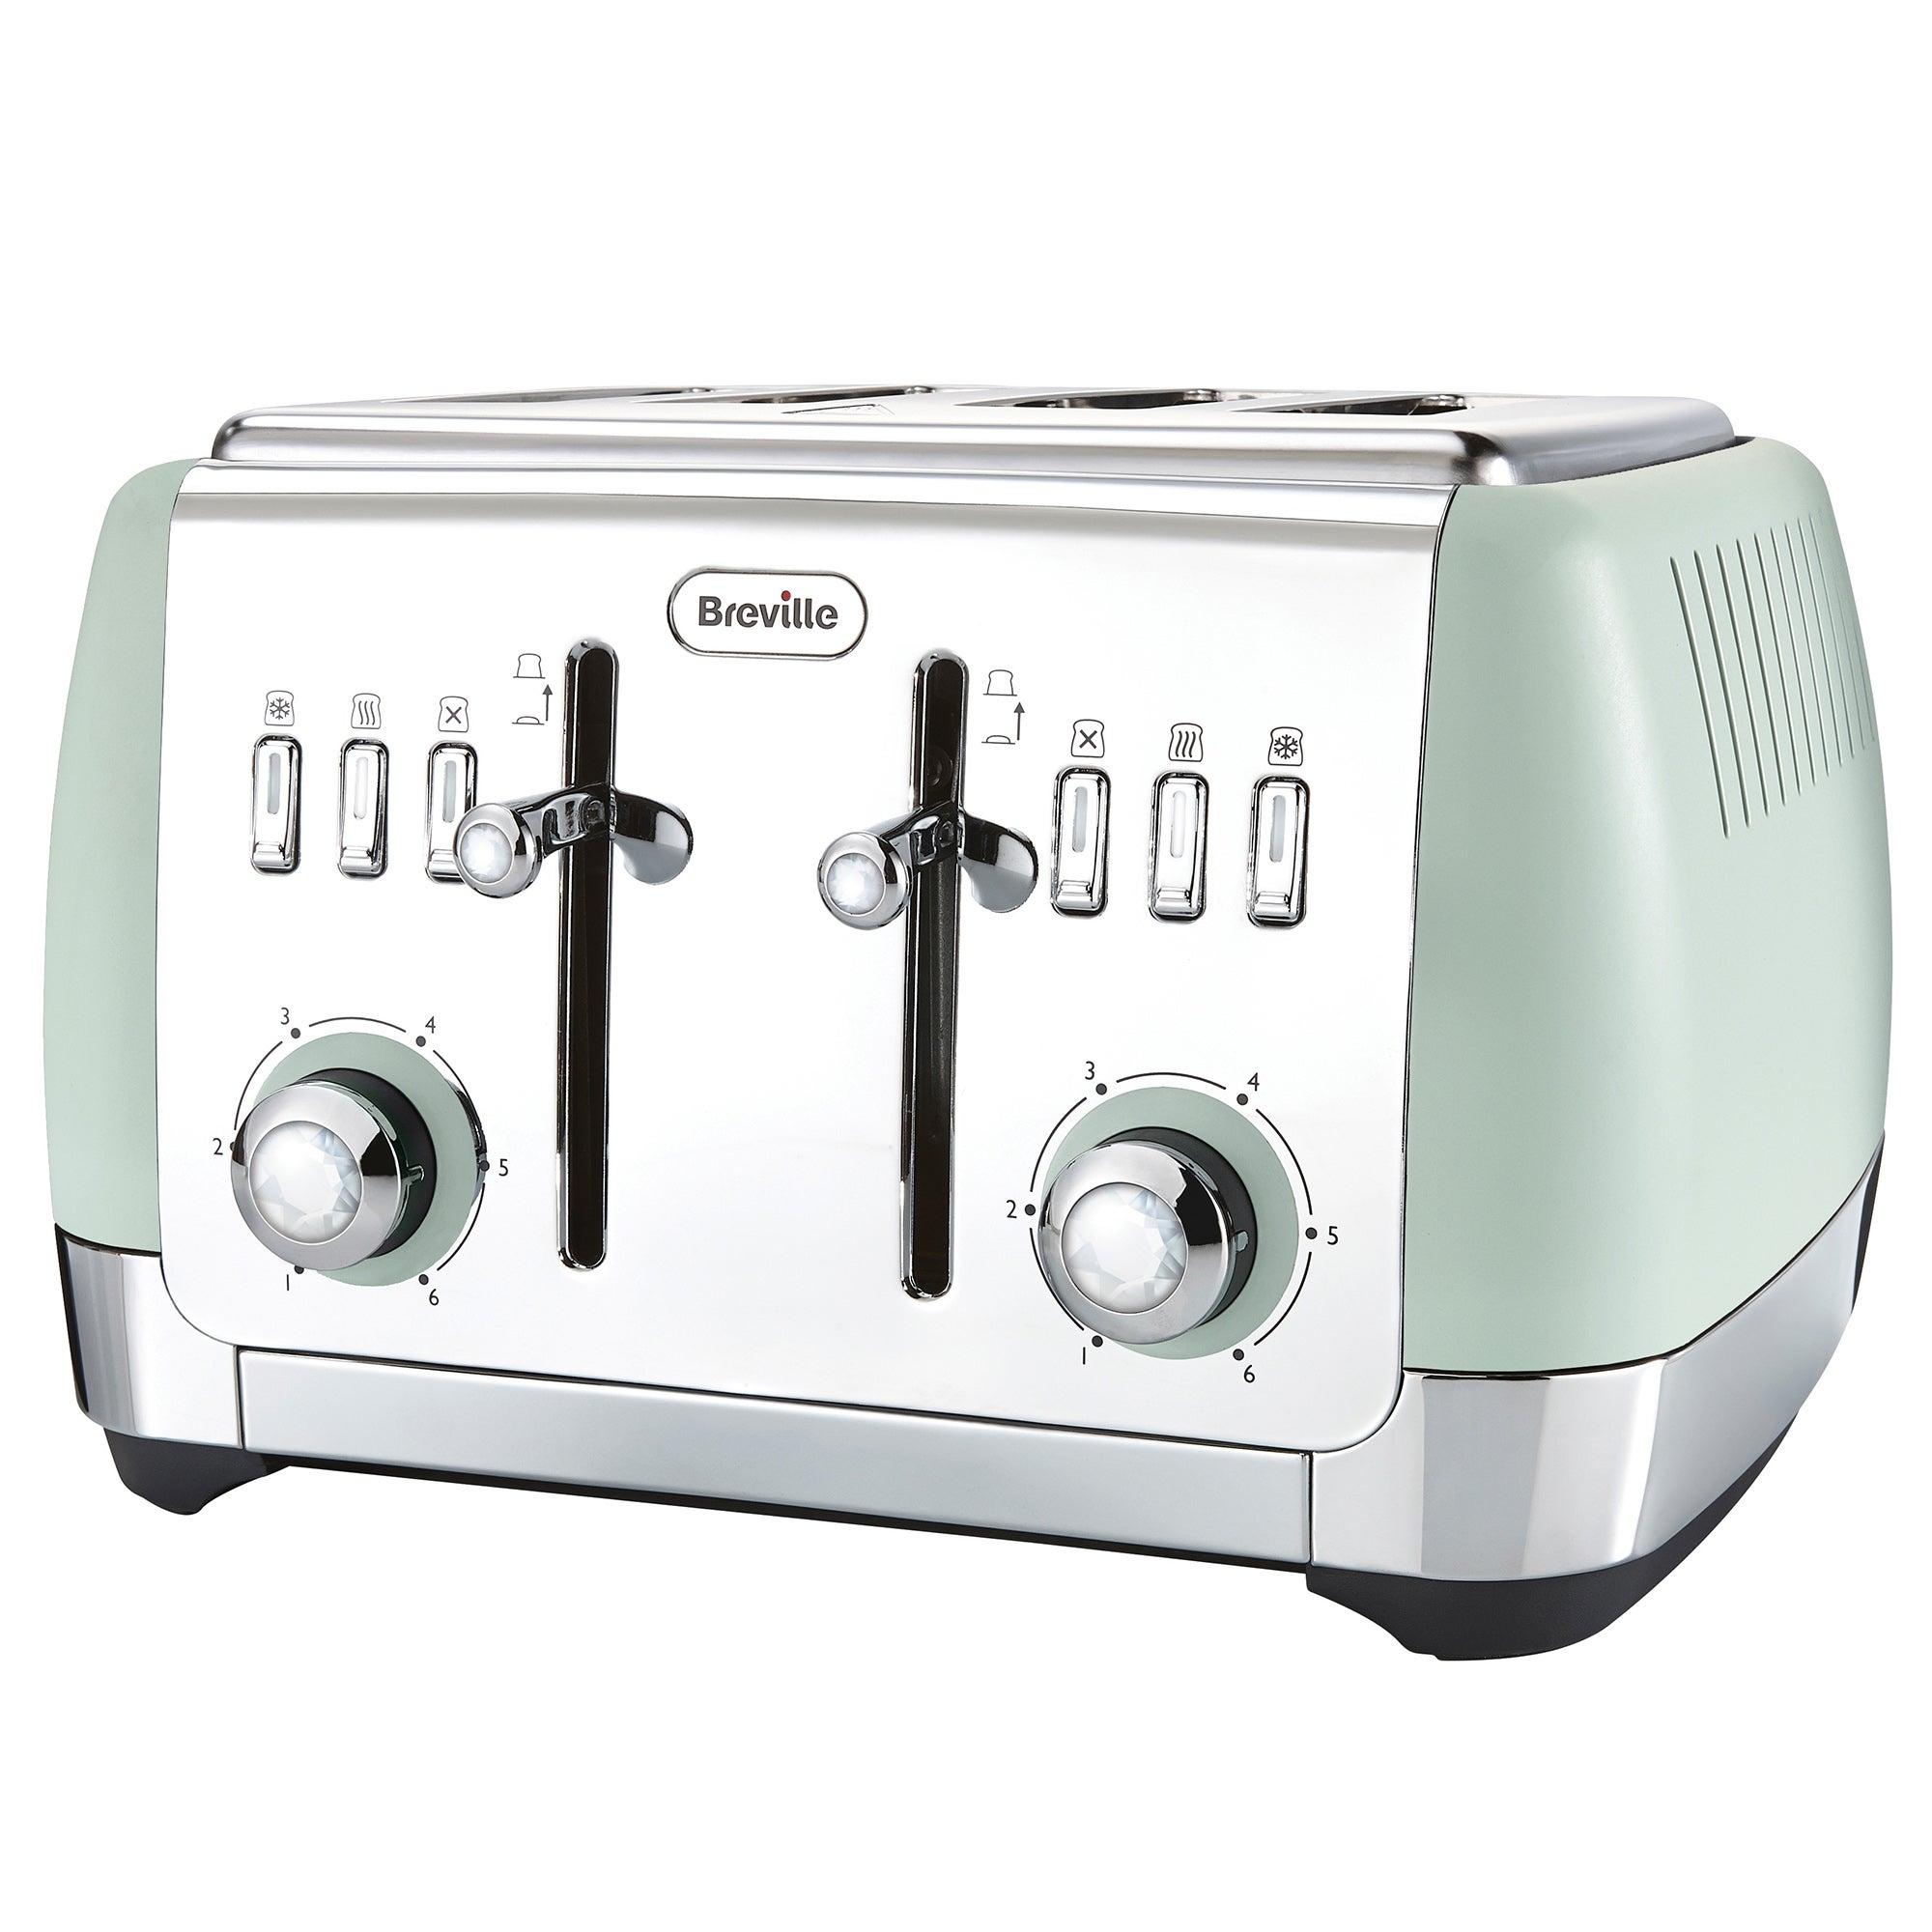 Breville VTT768 Strata Collection 4 Slice Green Toaster Green